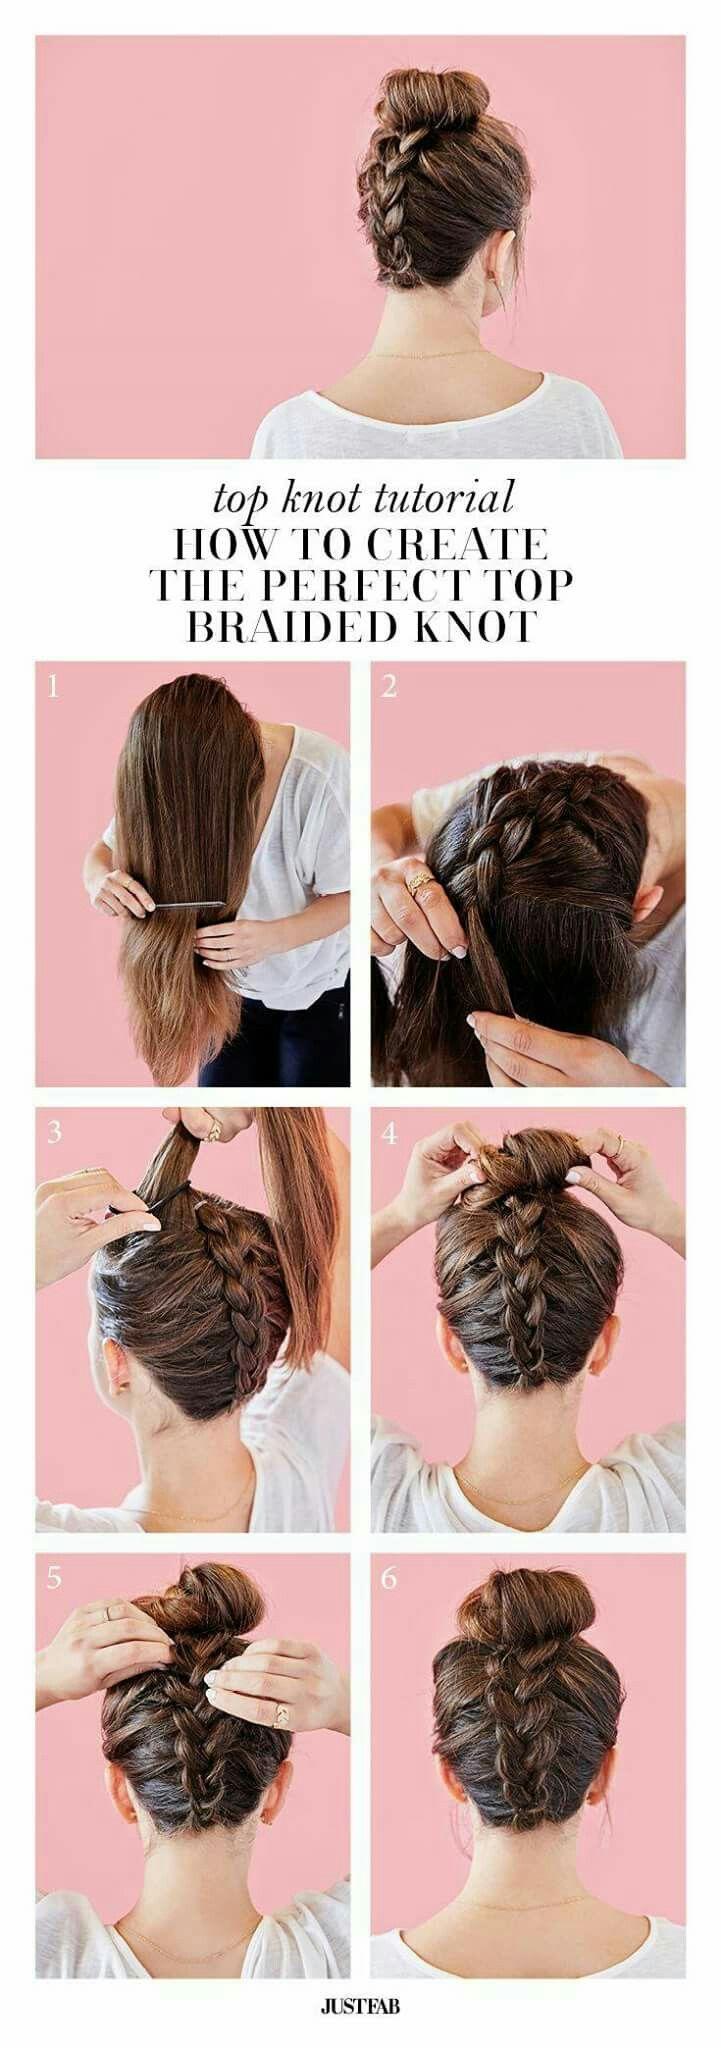 Pin by eider oñatibia on hairspiration pinterest hair style